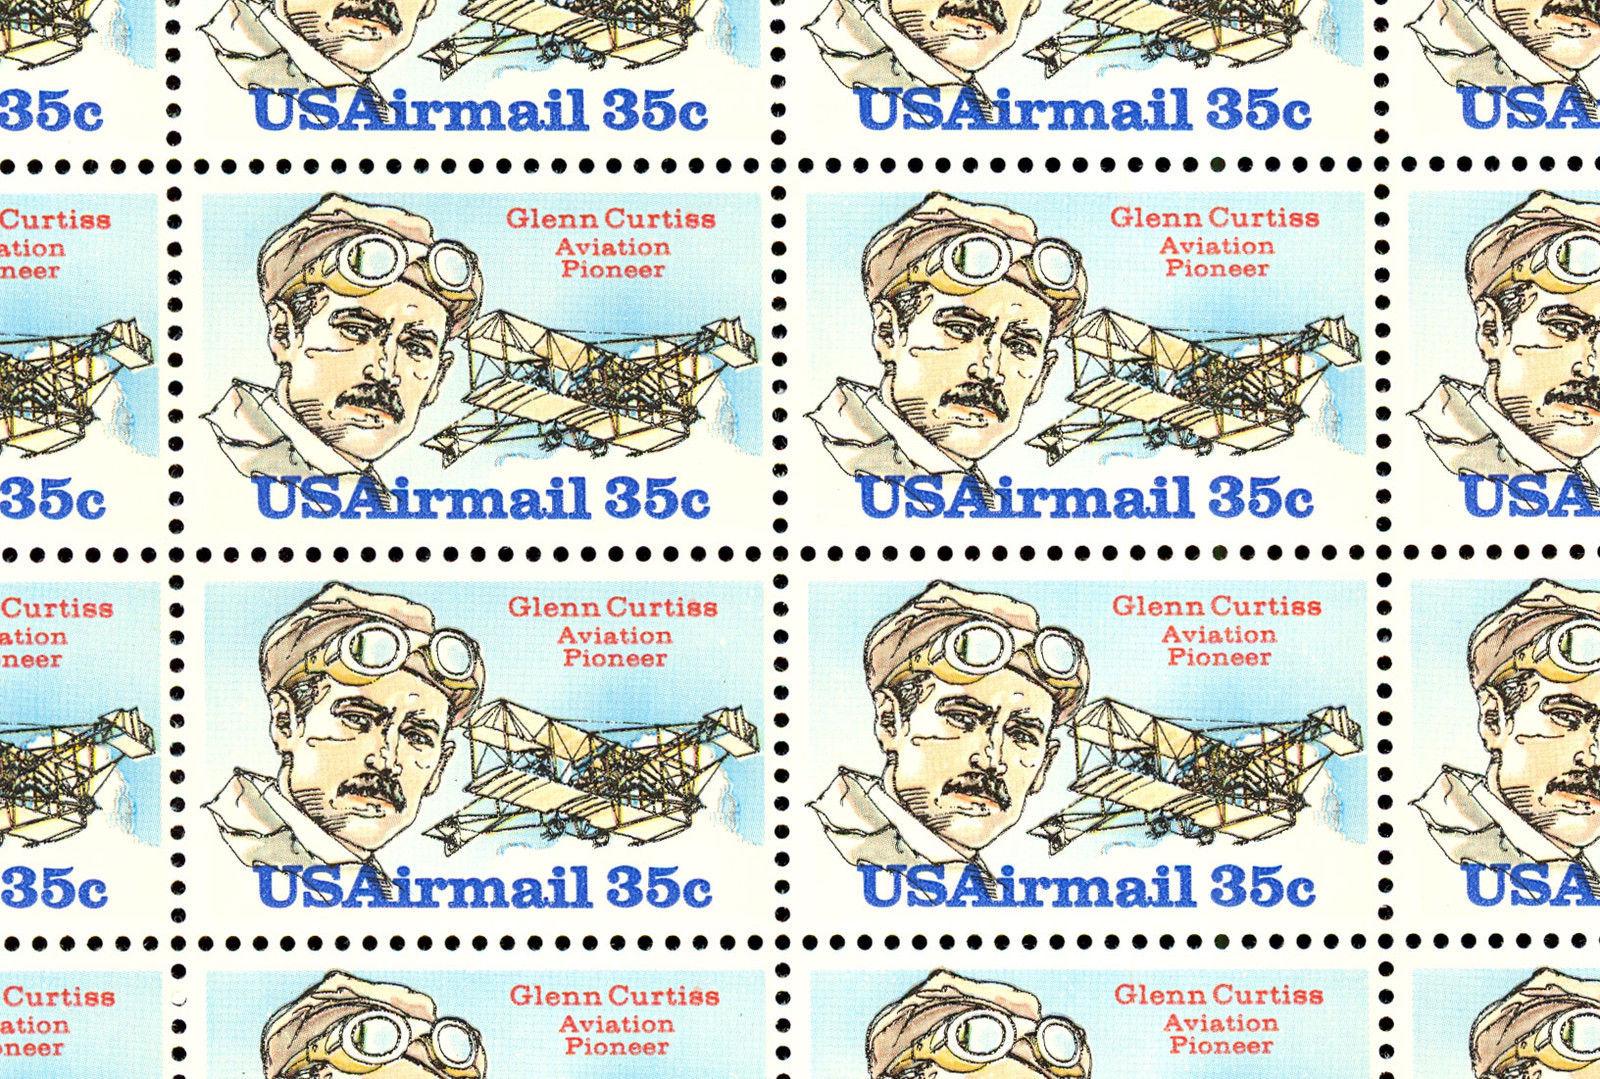 C100 Complete Sheet of 50 Glenn Curtis 35 Cent Airmail Stamps - Stuart Katz